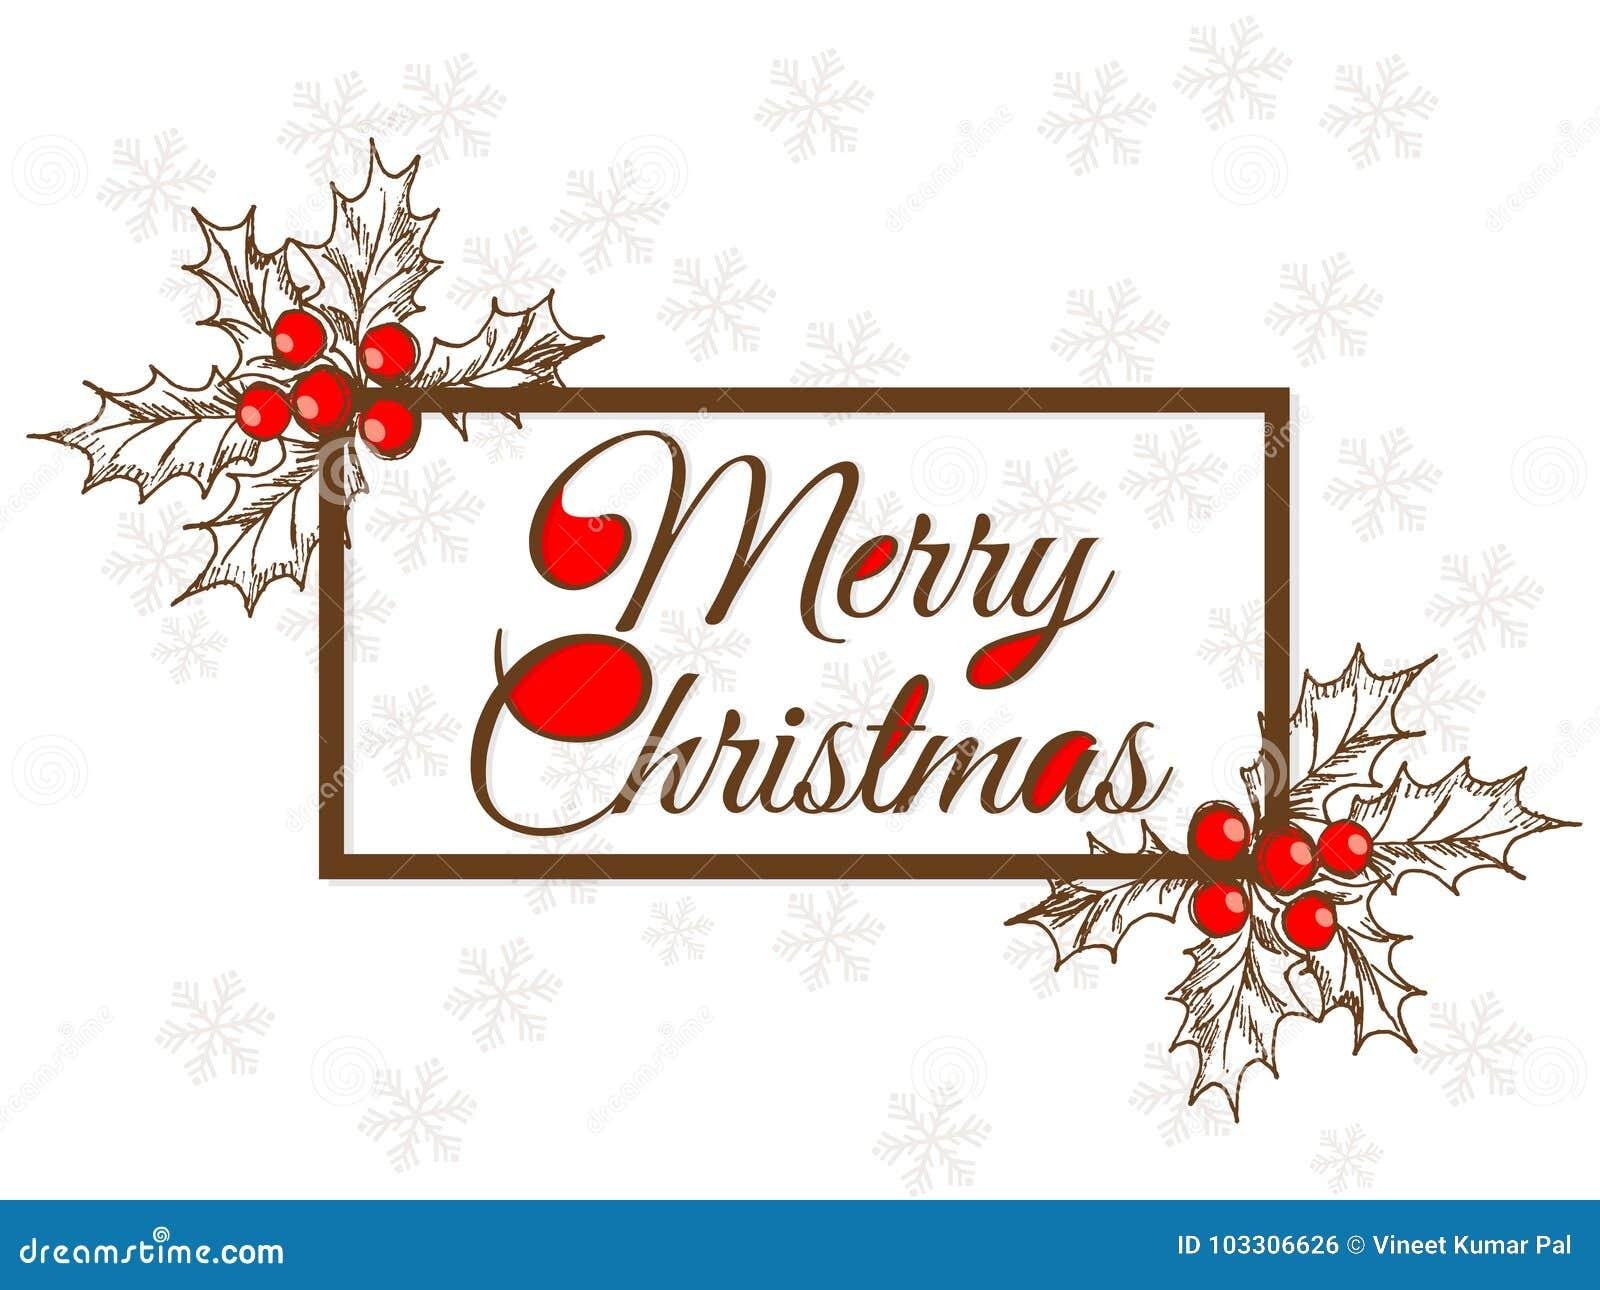 Merry christmas stock vector. Illustration of xmas, 2018 - 103306626